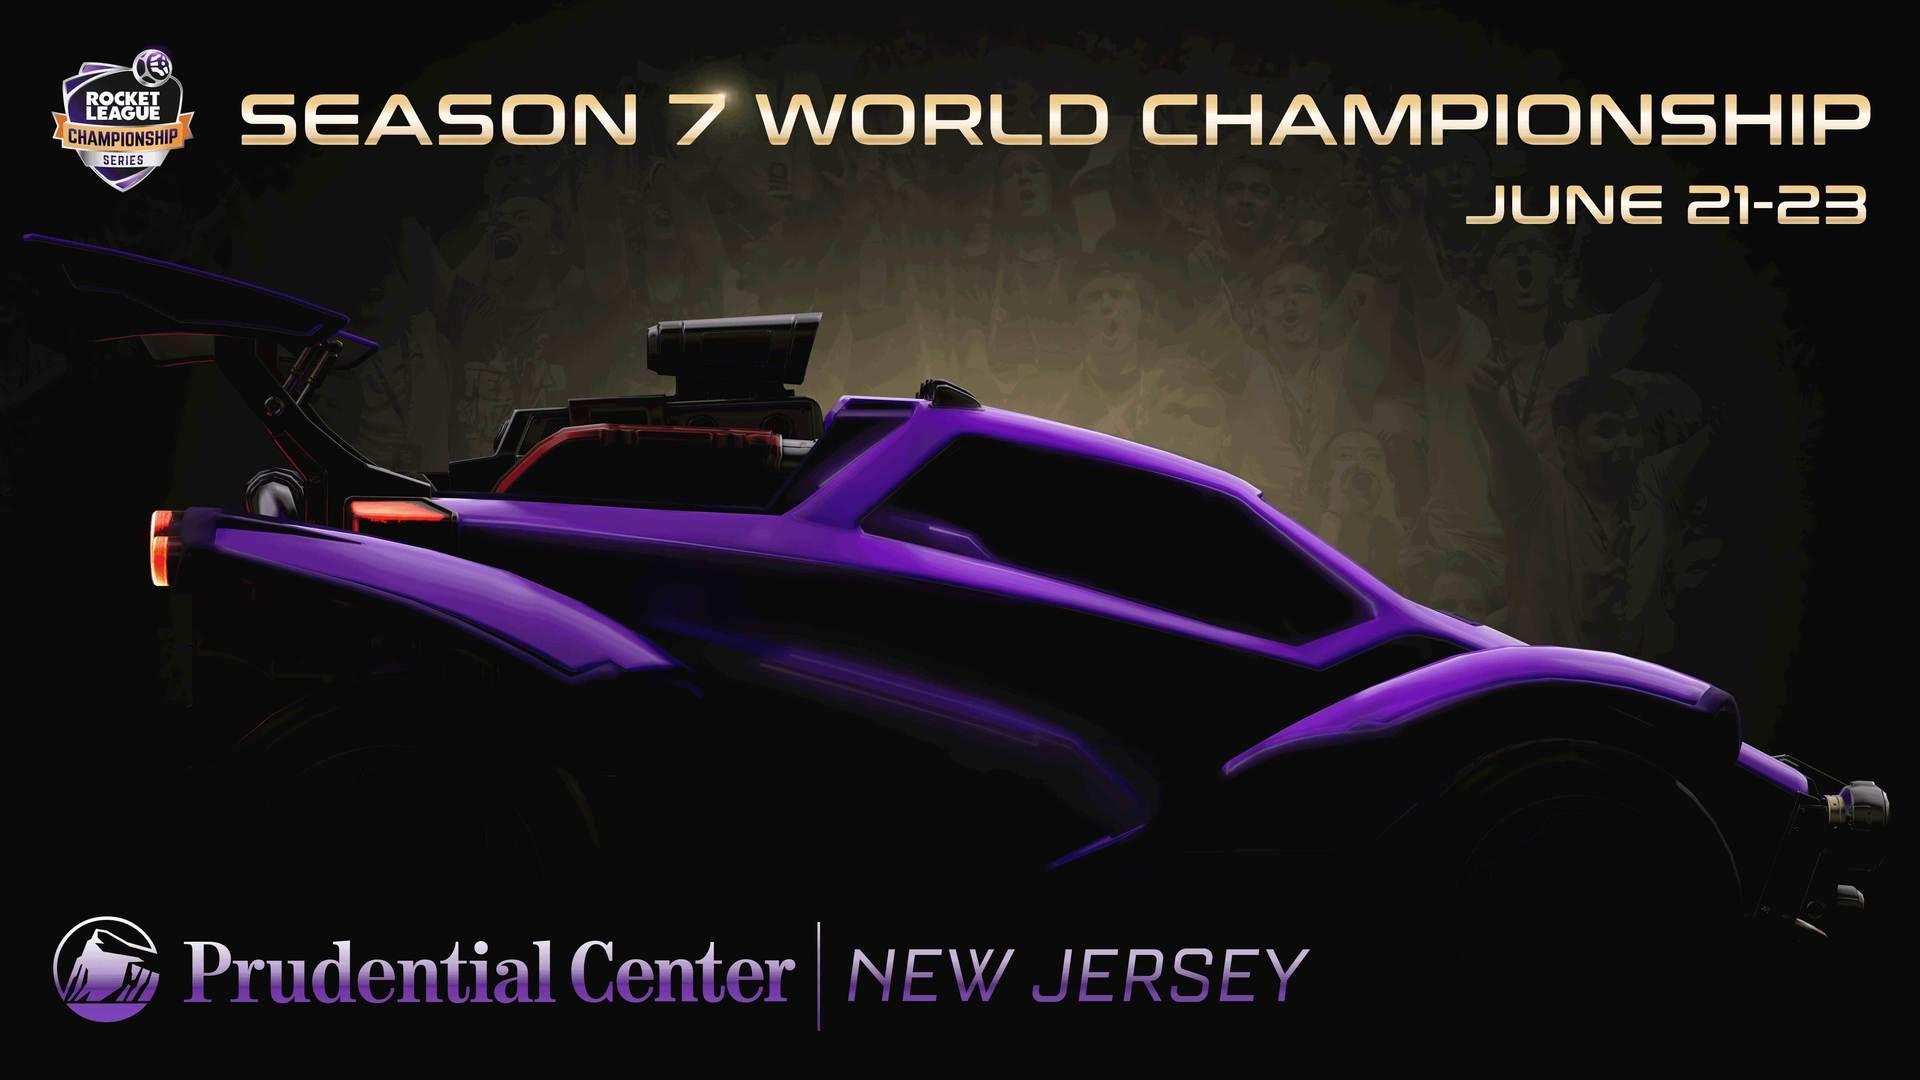 Season 7 World Championship Tickets On Sale NOW! Image